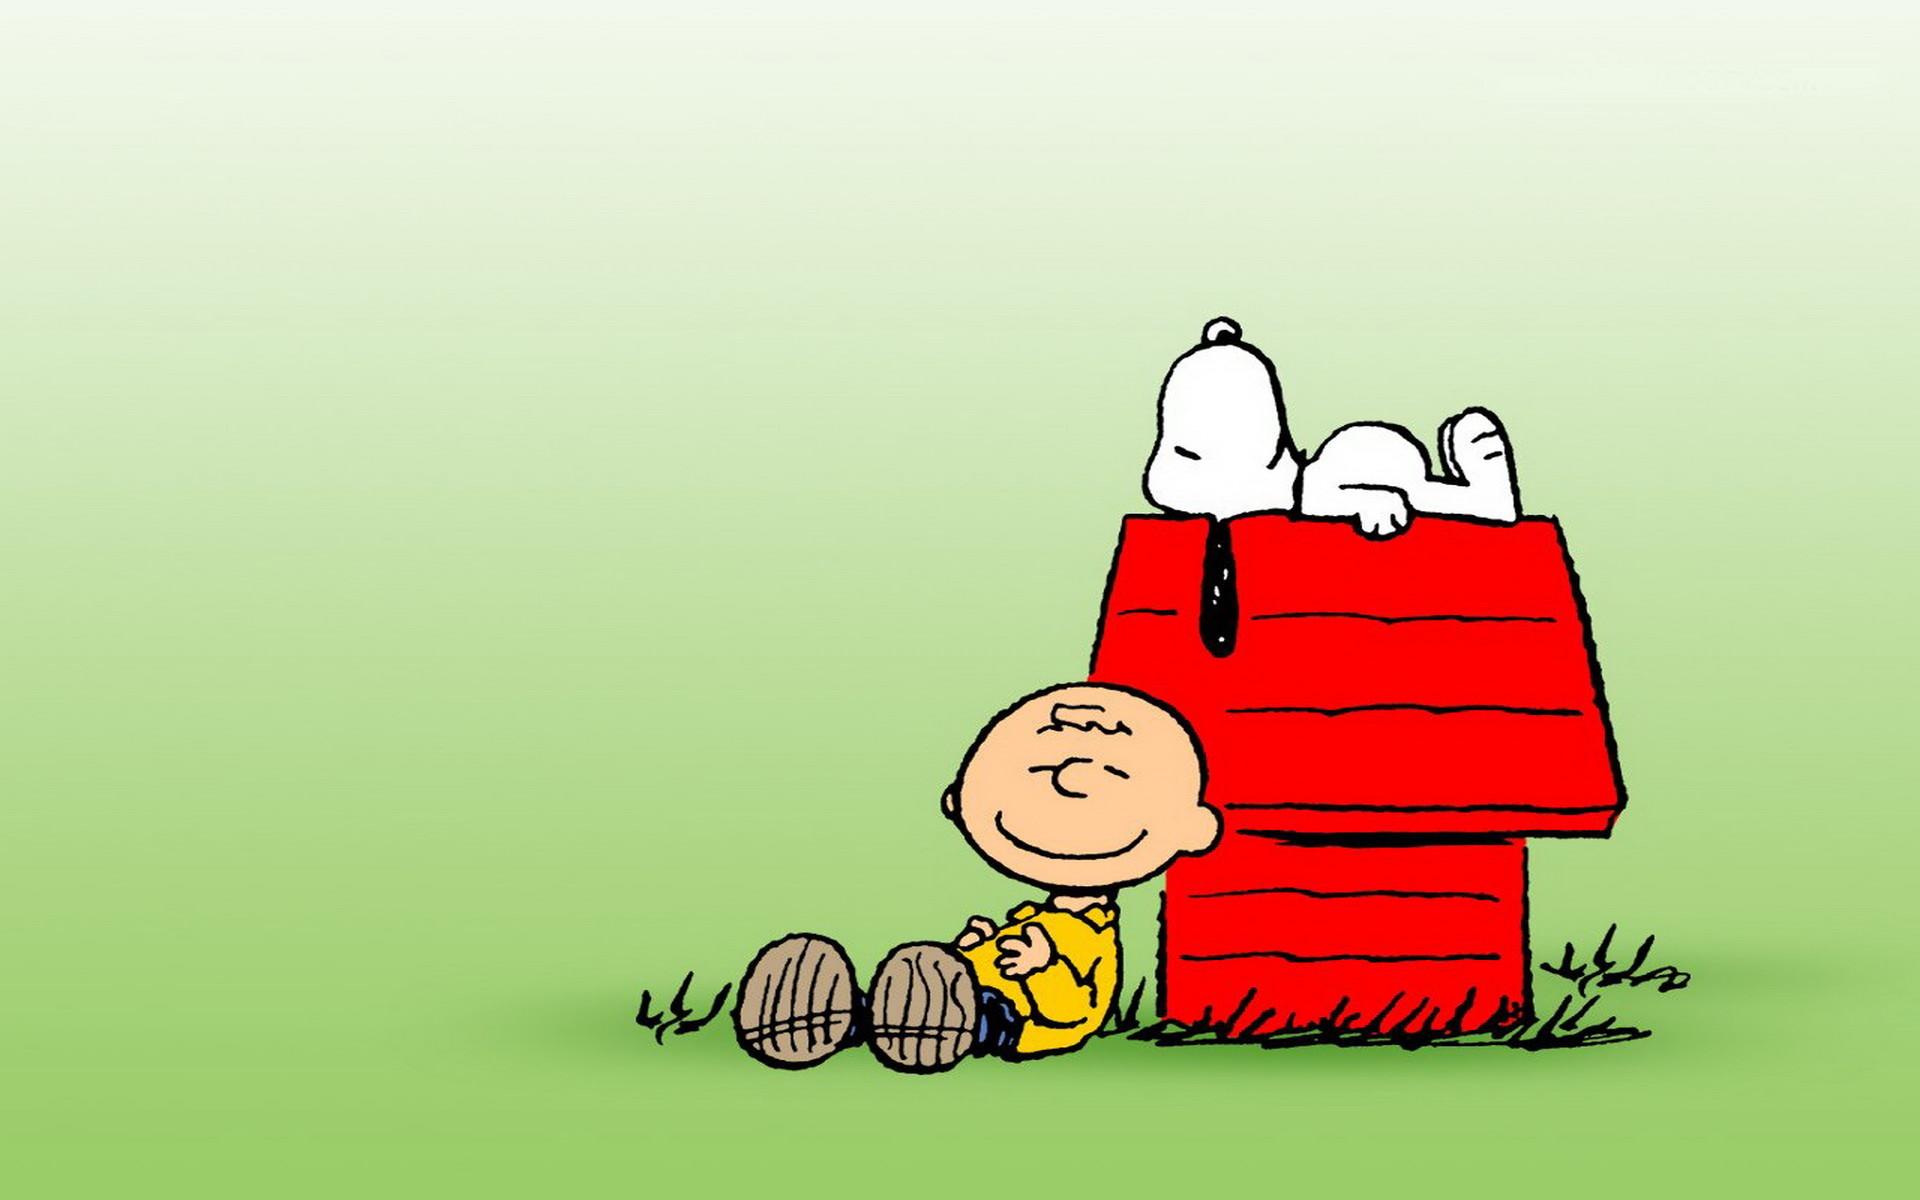 Charlie Brown Wallpapers (59 Wallpapers)